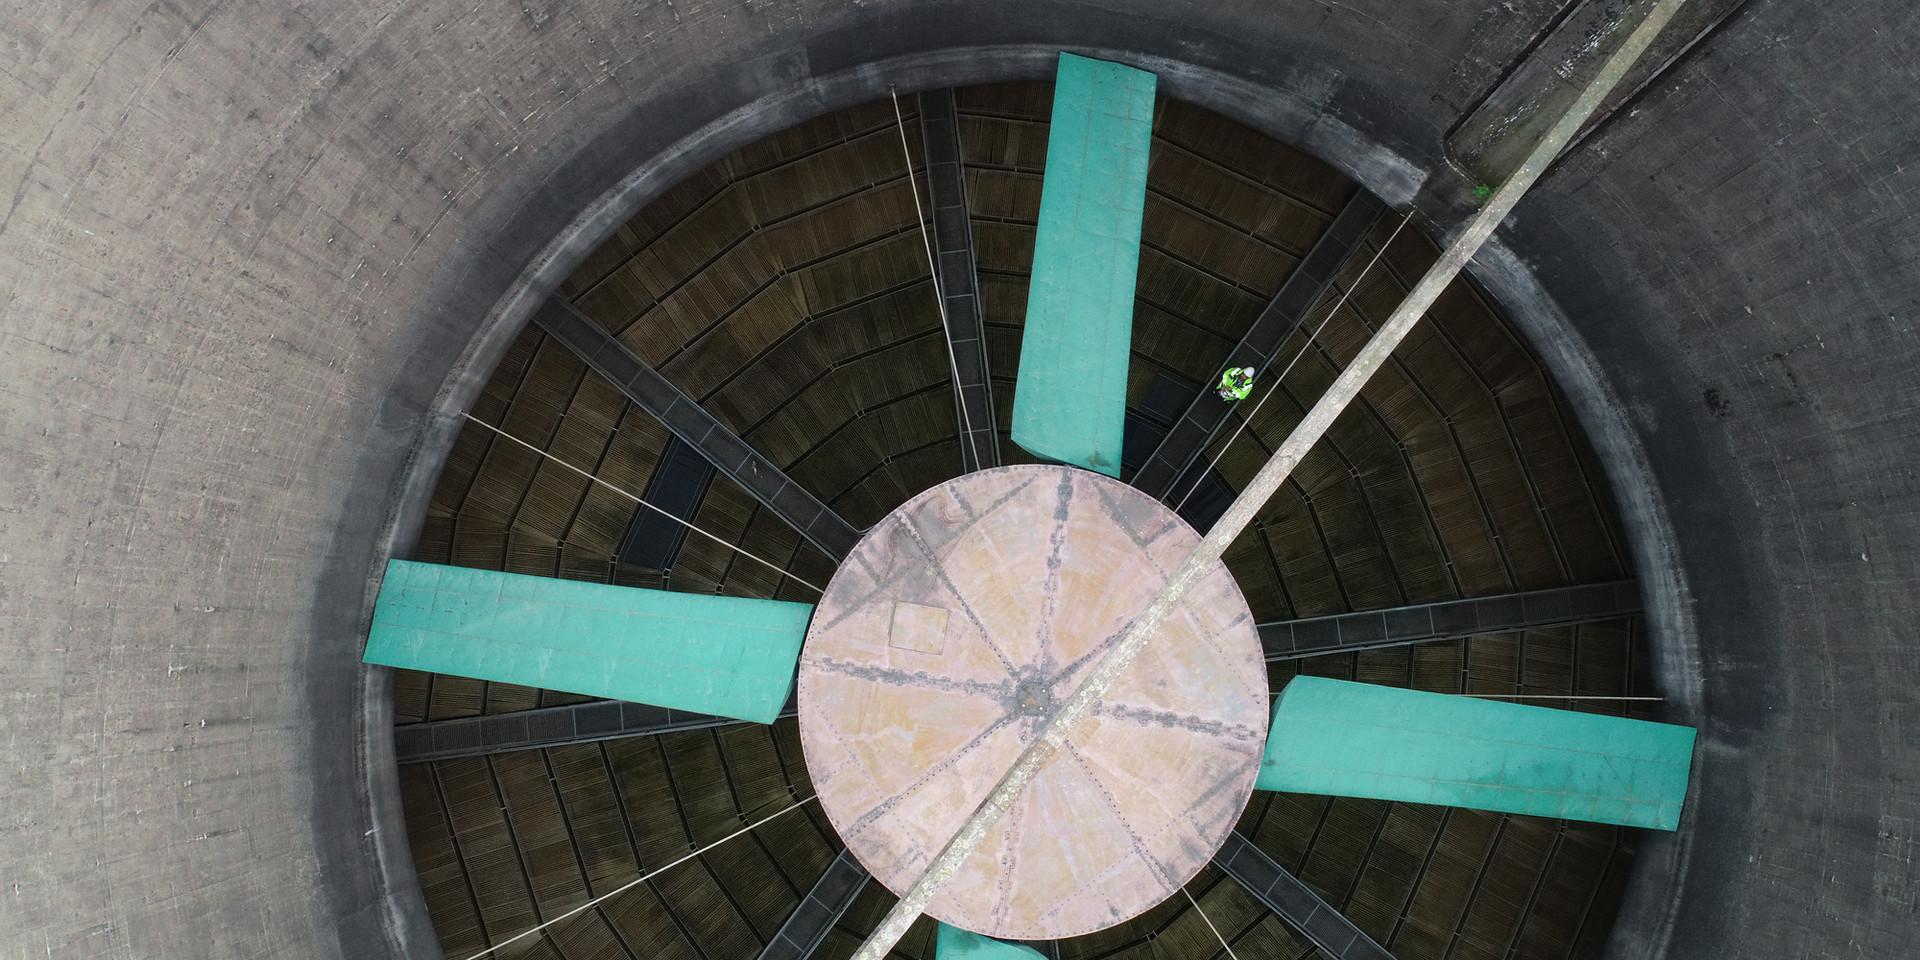 Kühlturminspektion per Drohne